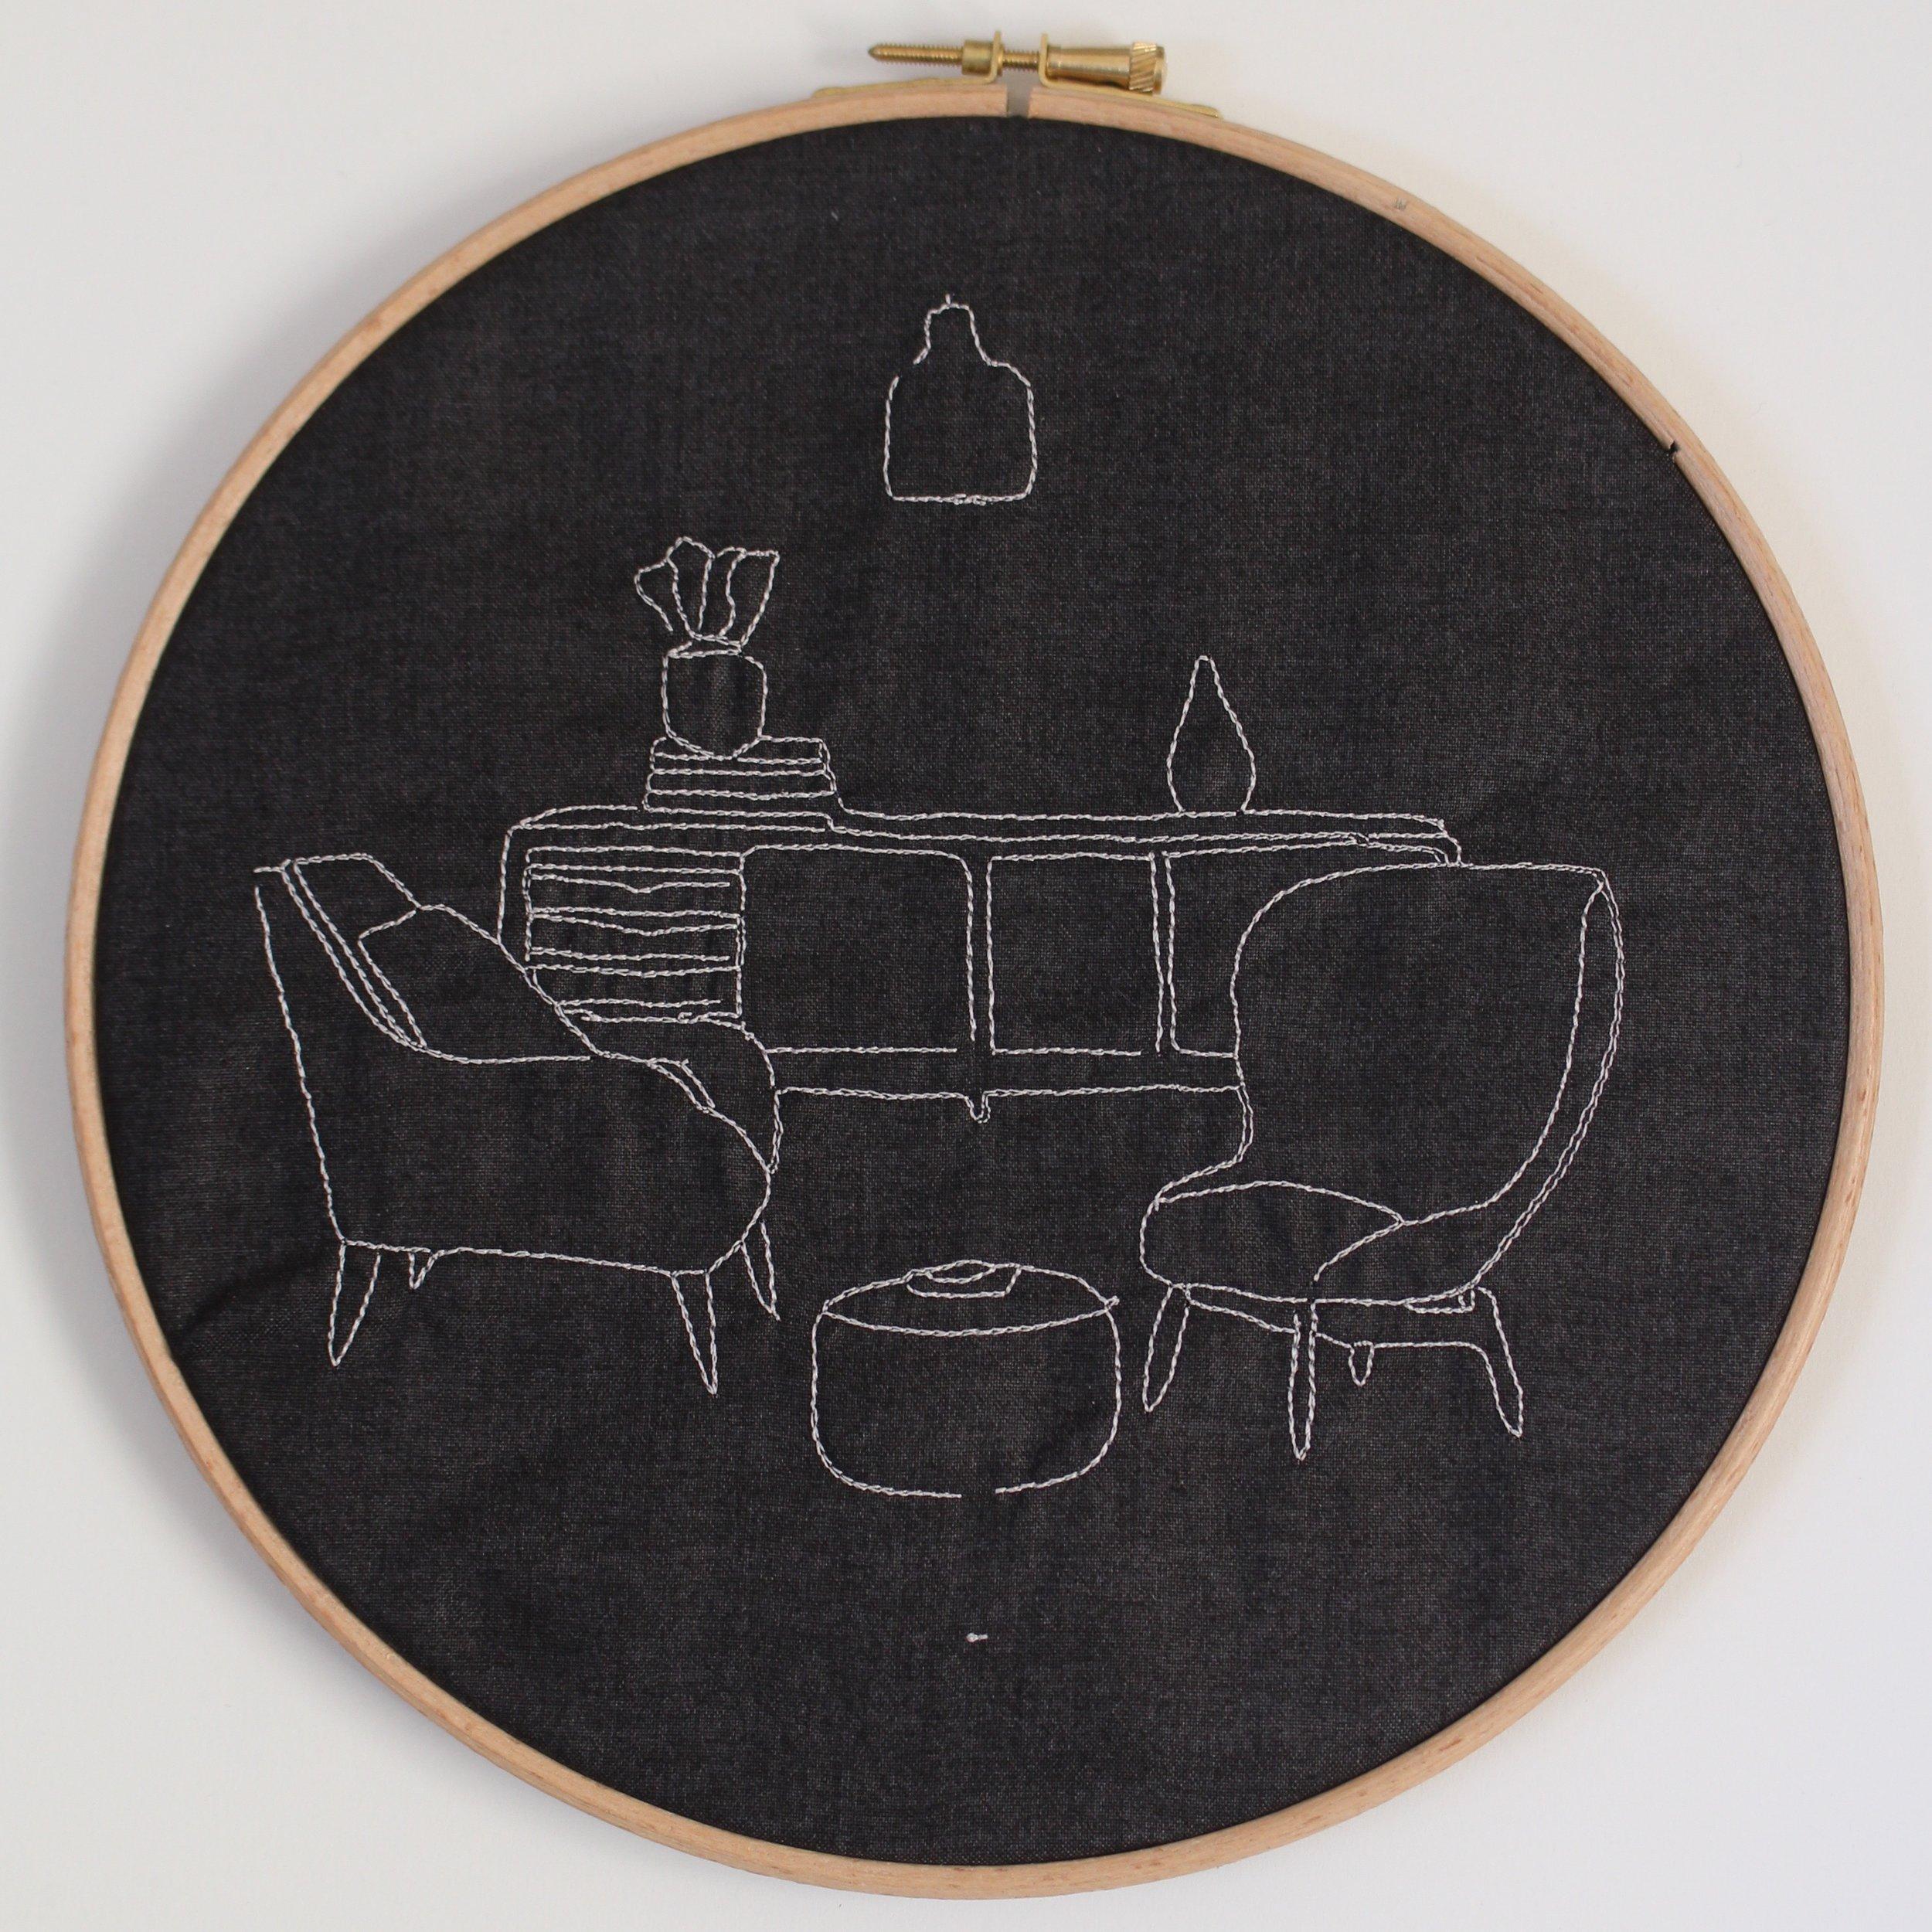 hoopedinteriorembroidery